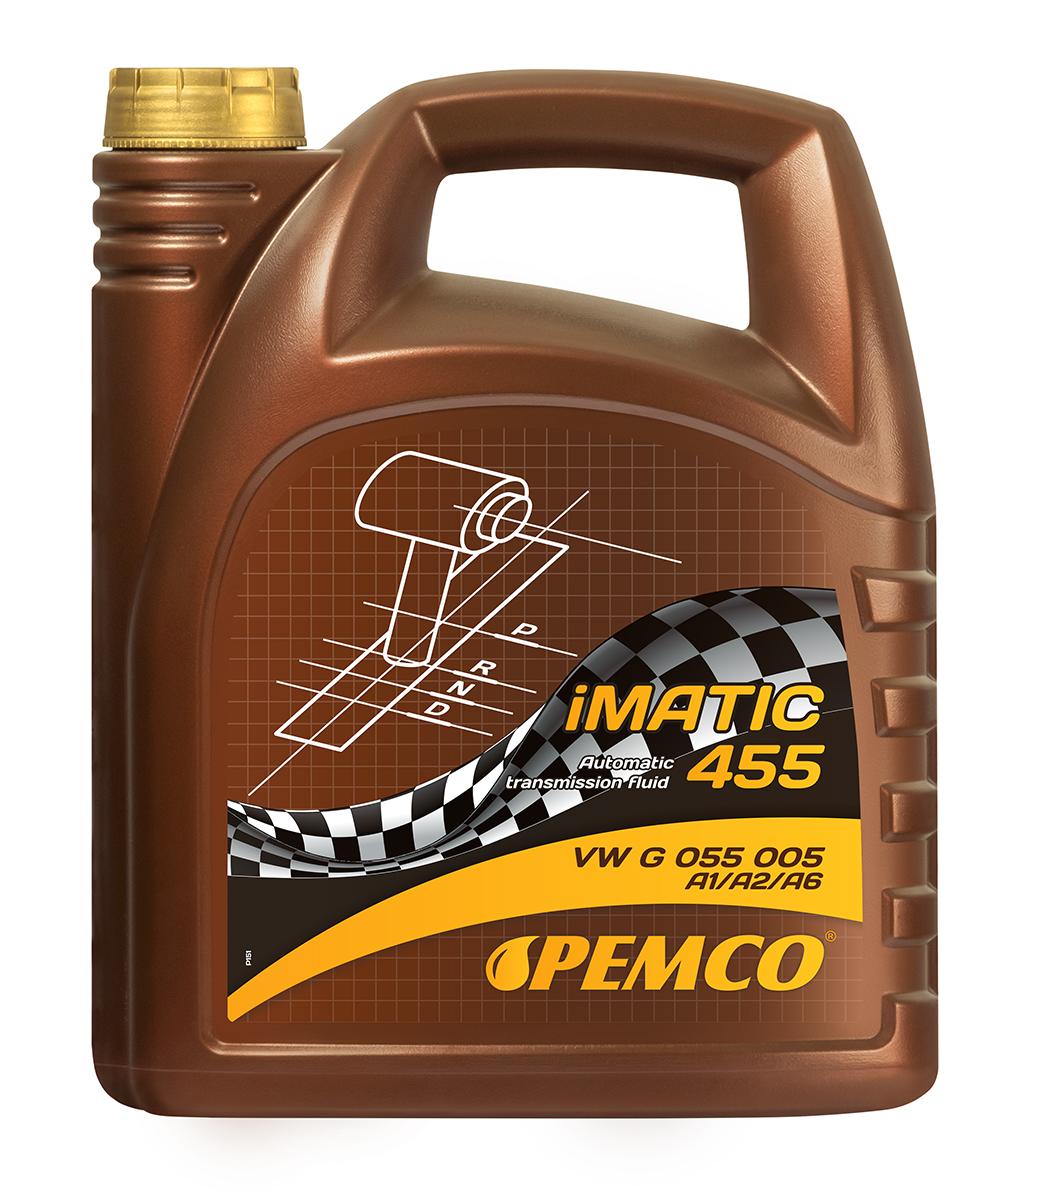 iMATIC 455